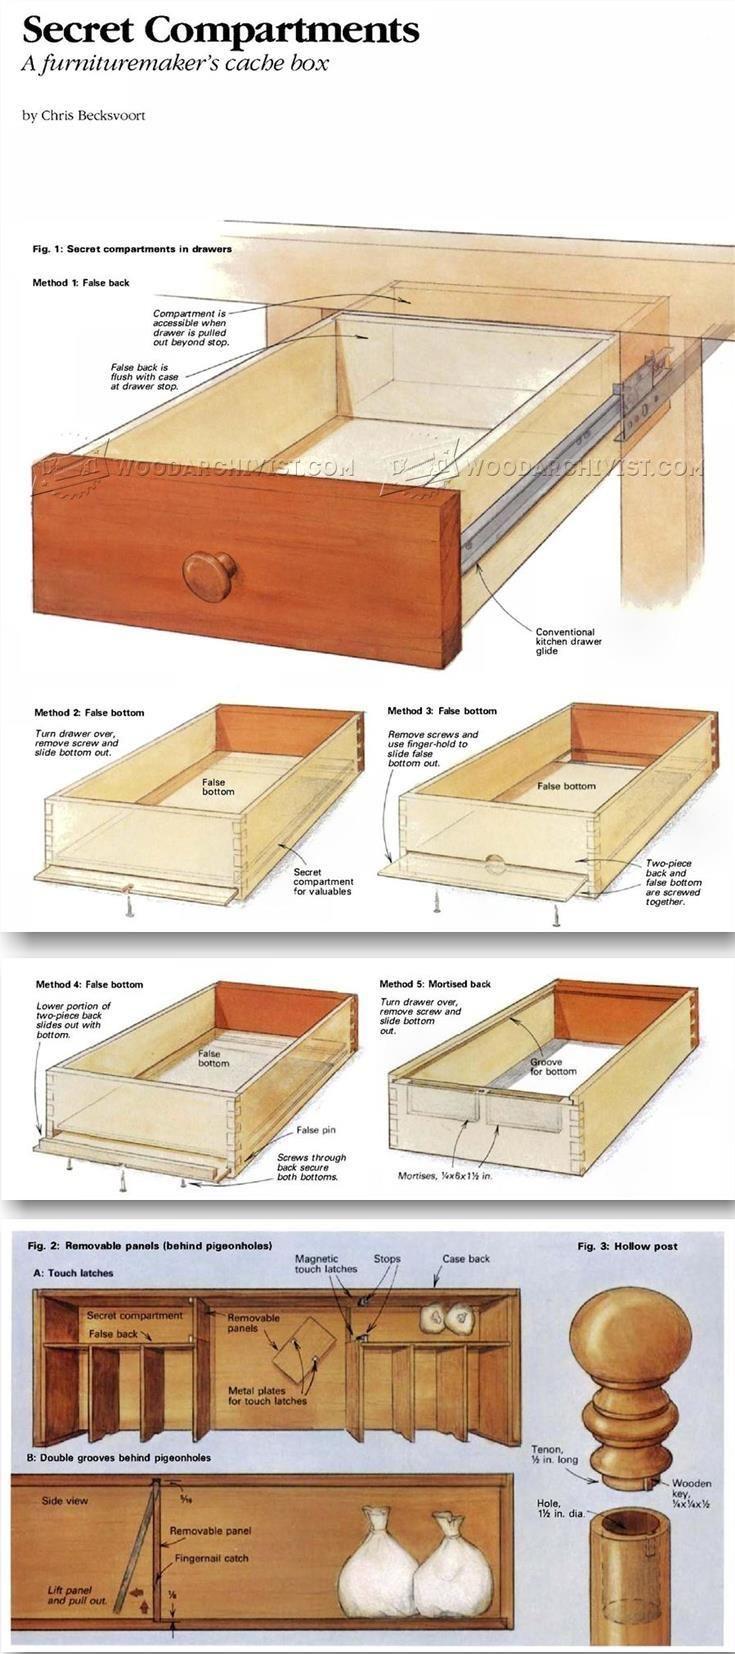 Furniture Secret Compartments Furniture Plans And Projects Woodarchivist Com Planos De Muebles Planos De Carpinteria Diseno Madera